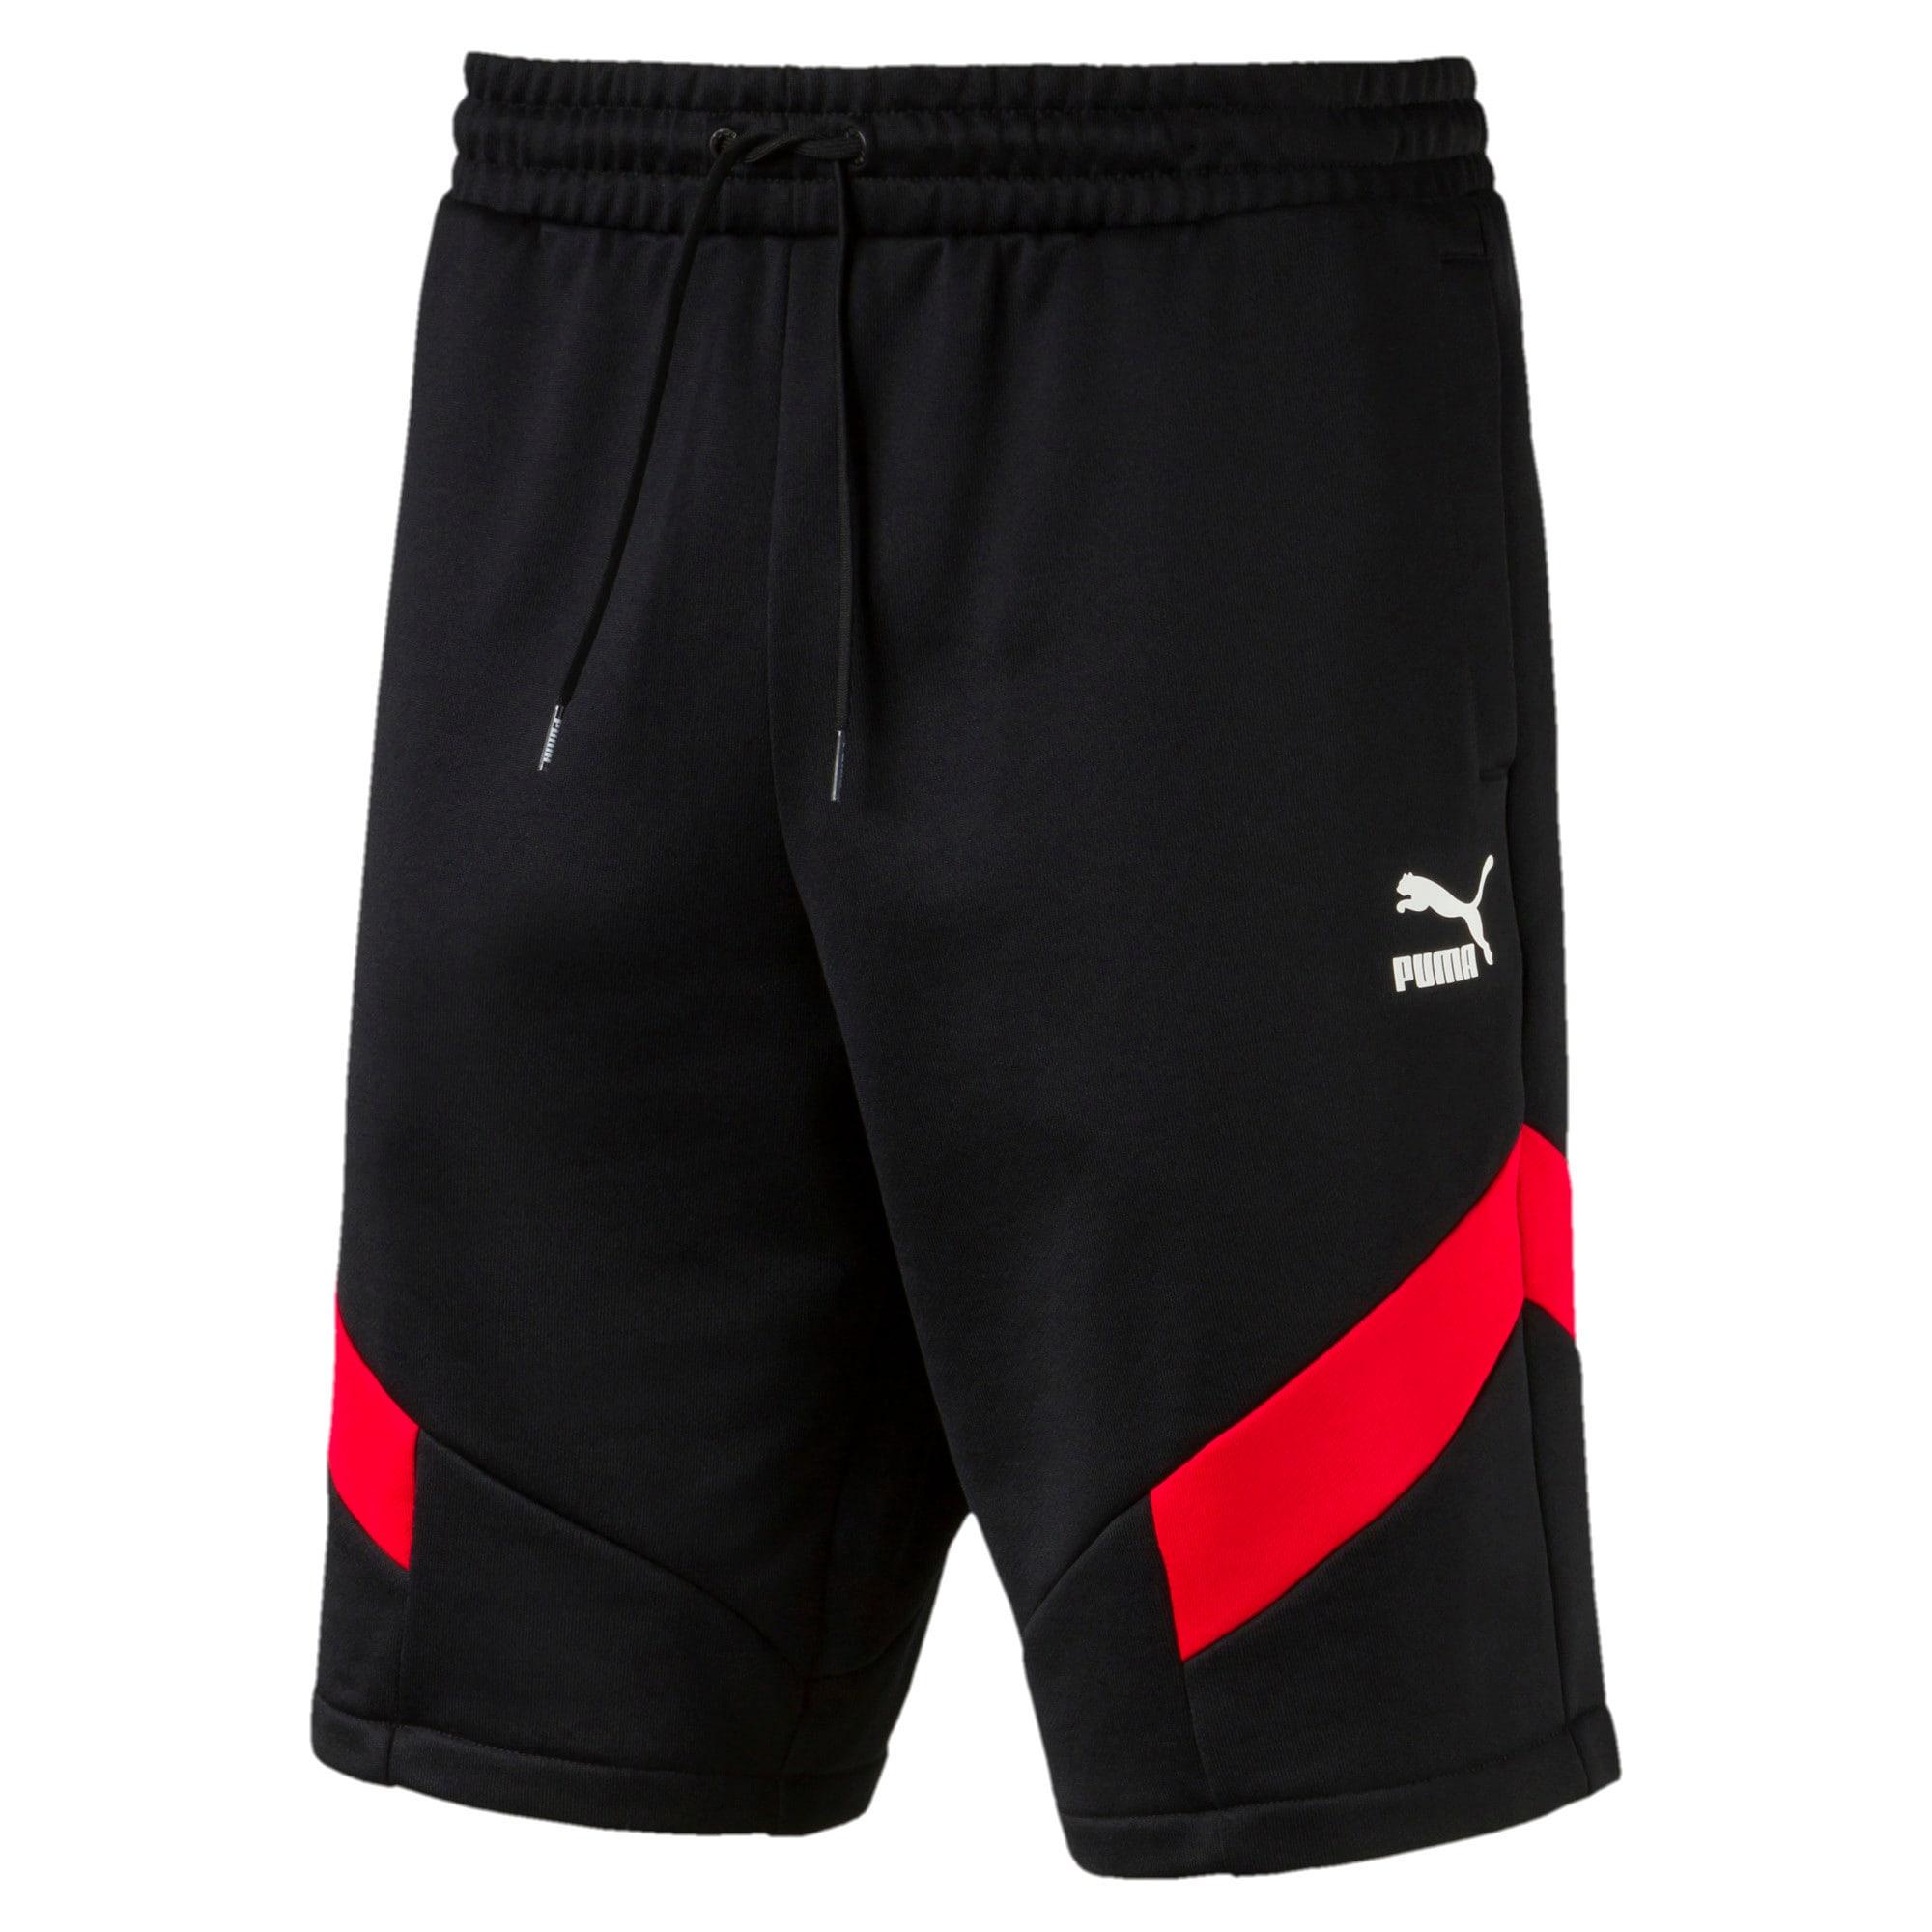 "Thumbnail 4 of Iconic MCS Knitted 10"" Men's Shorts, Puma Black, medium-IND"